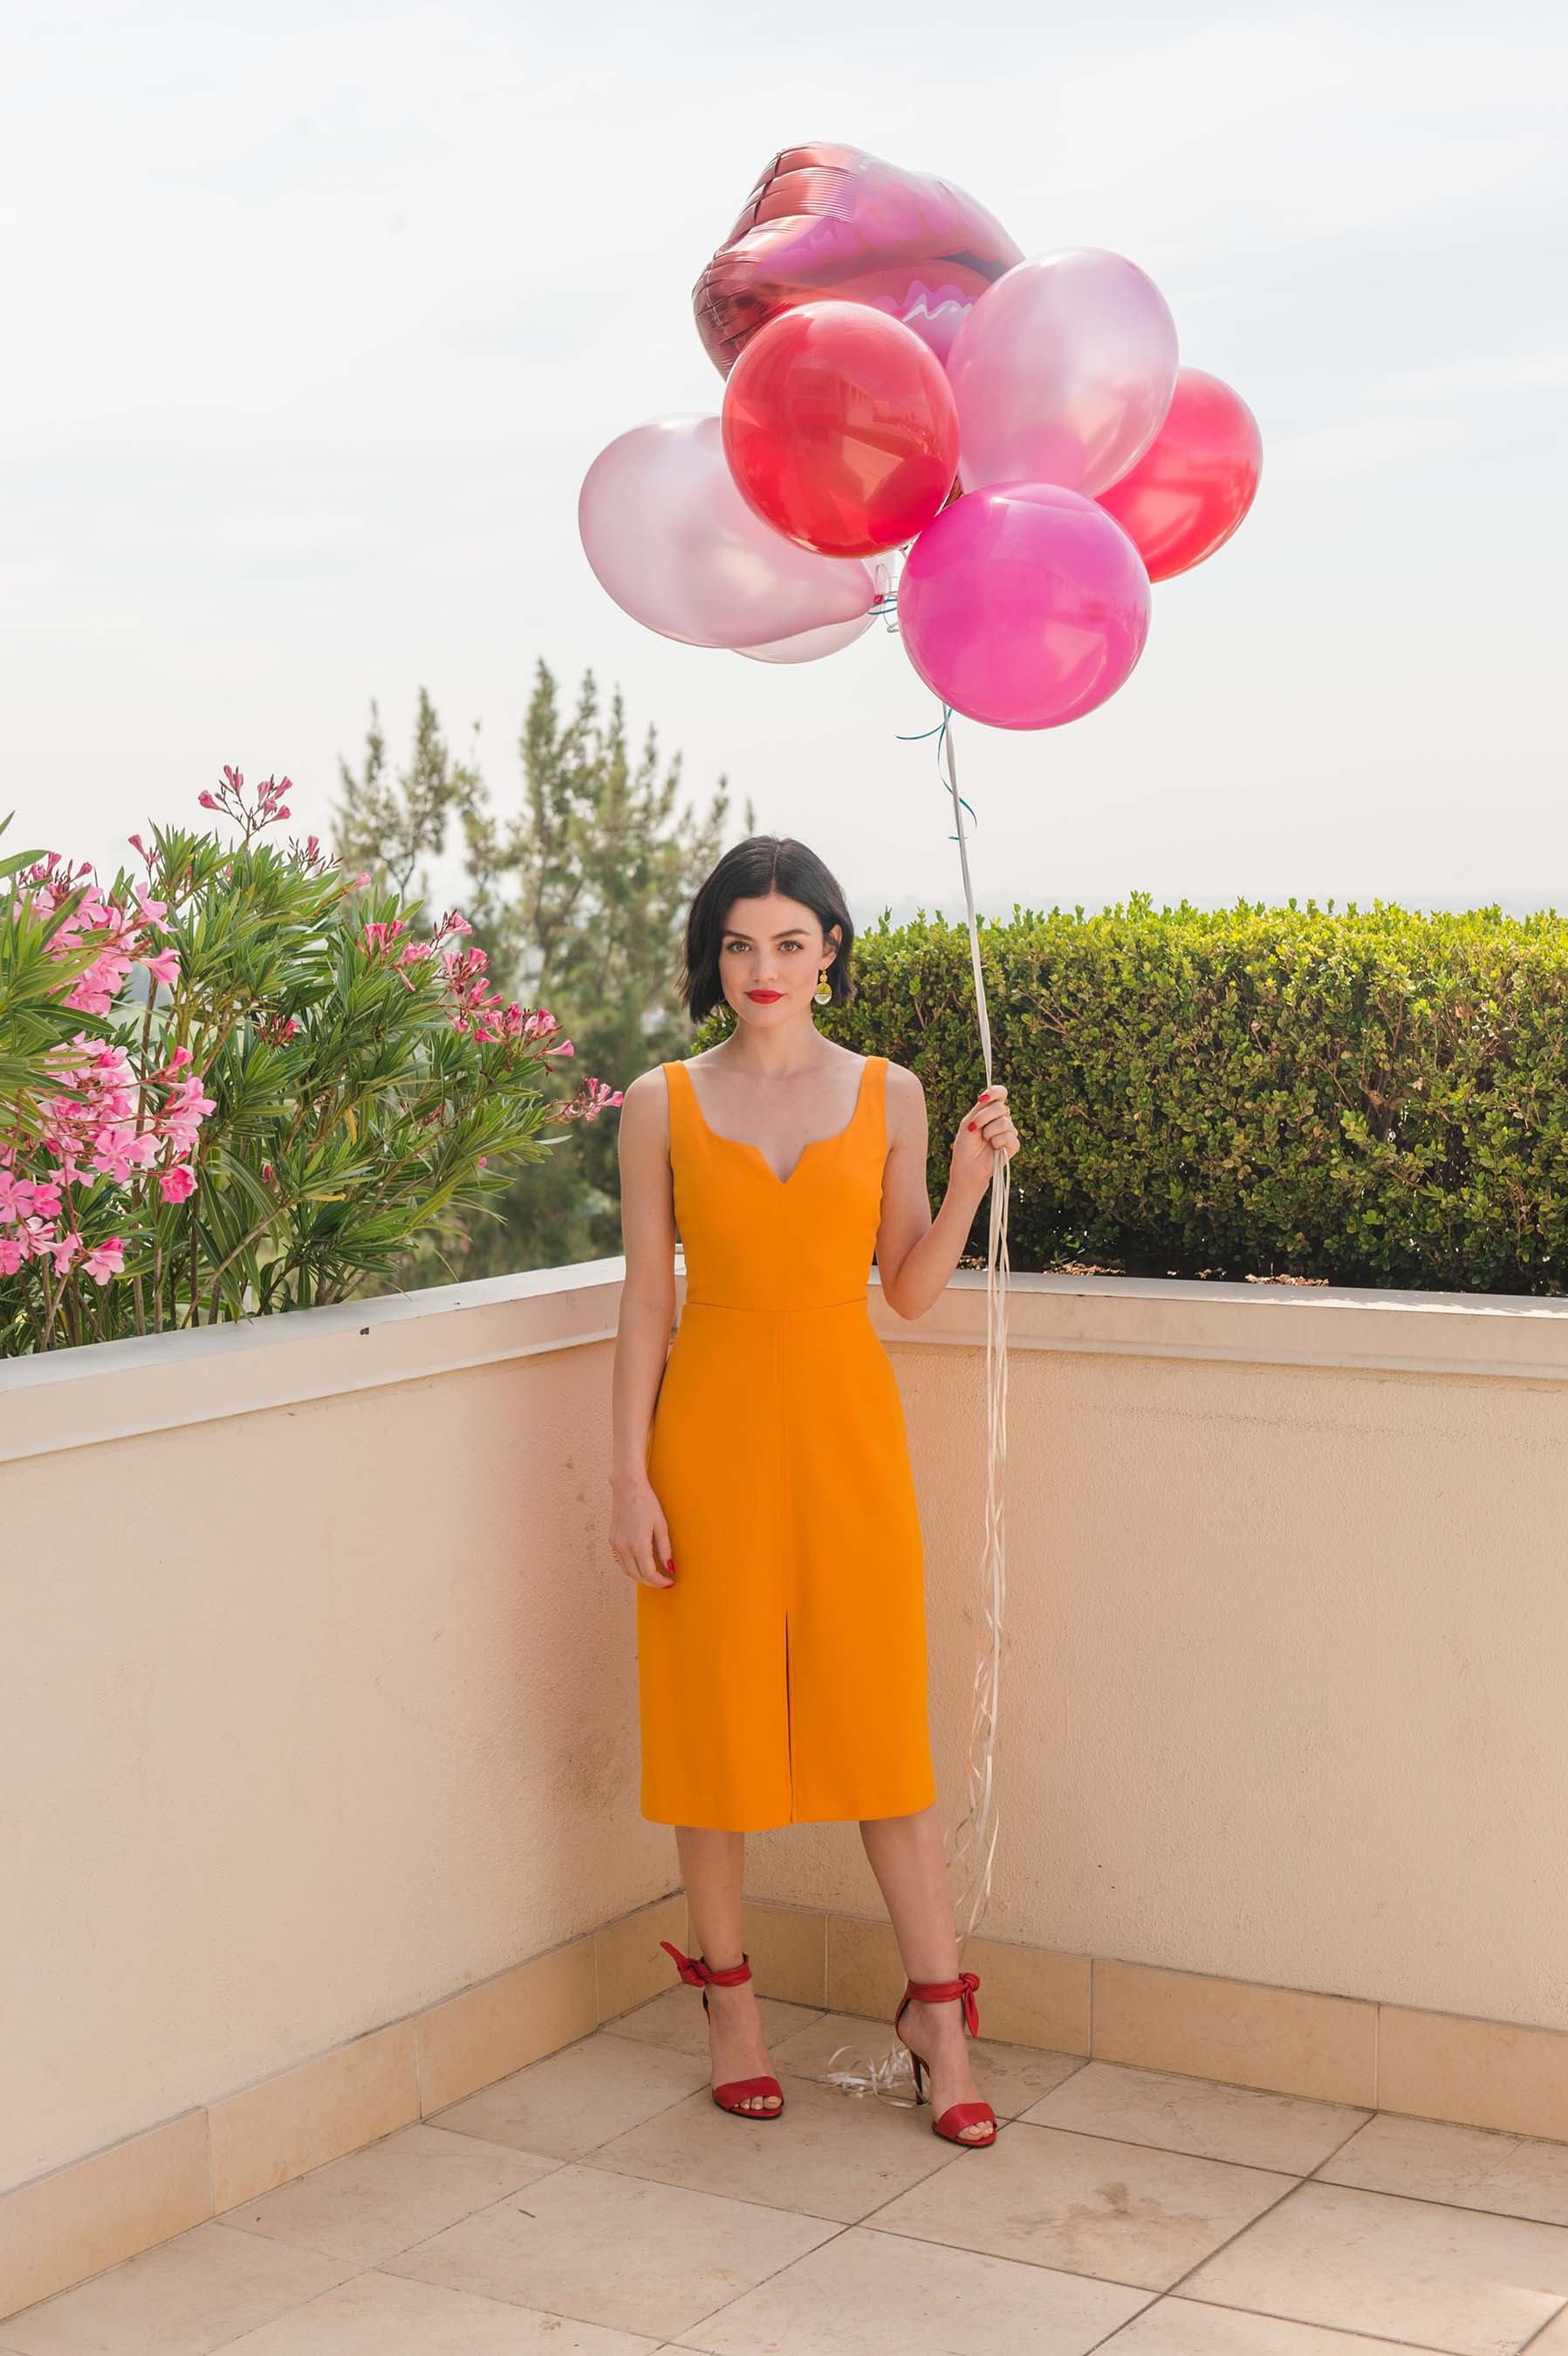 Brand Ambassador Lucy Hale celebrates National Lipstick Day